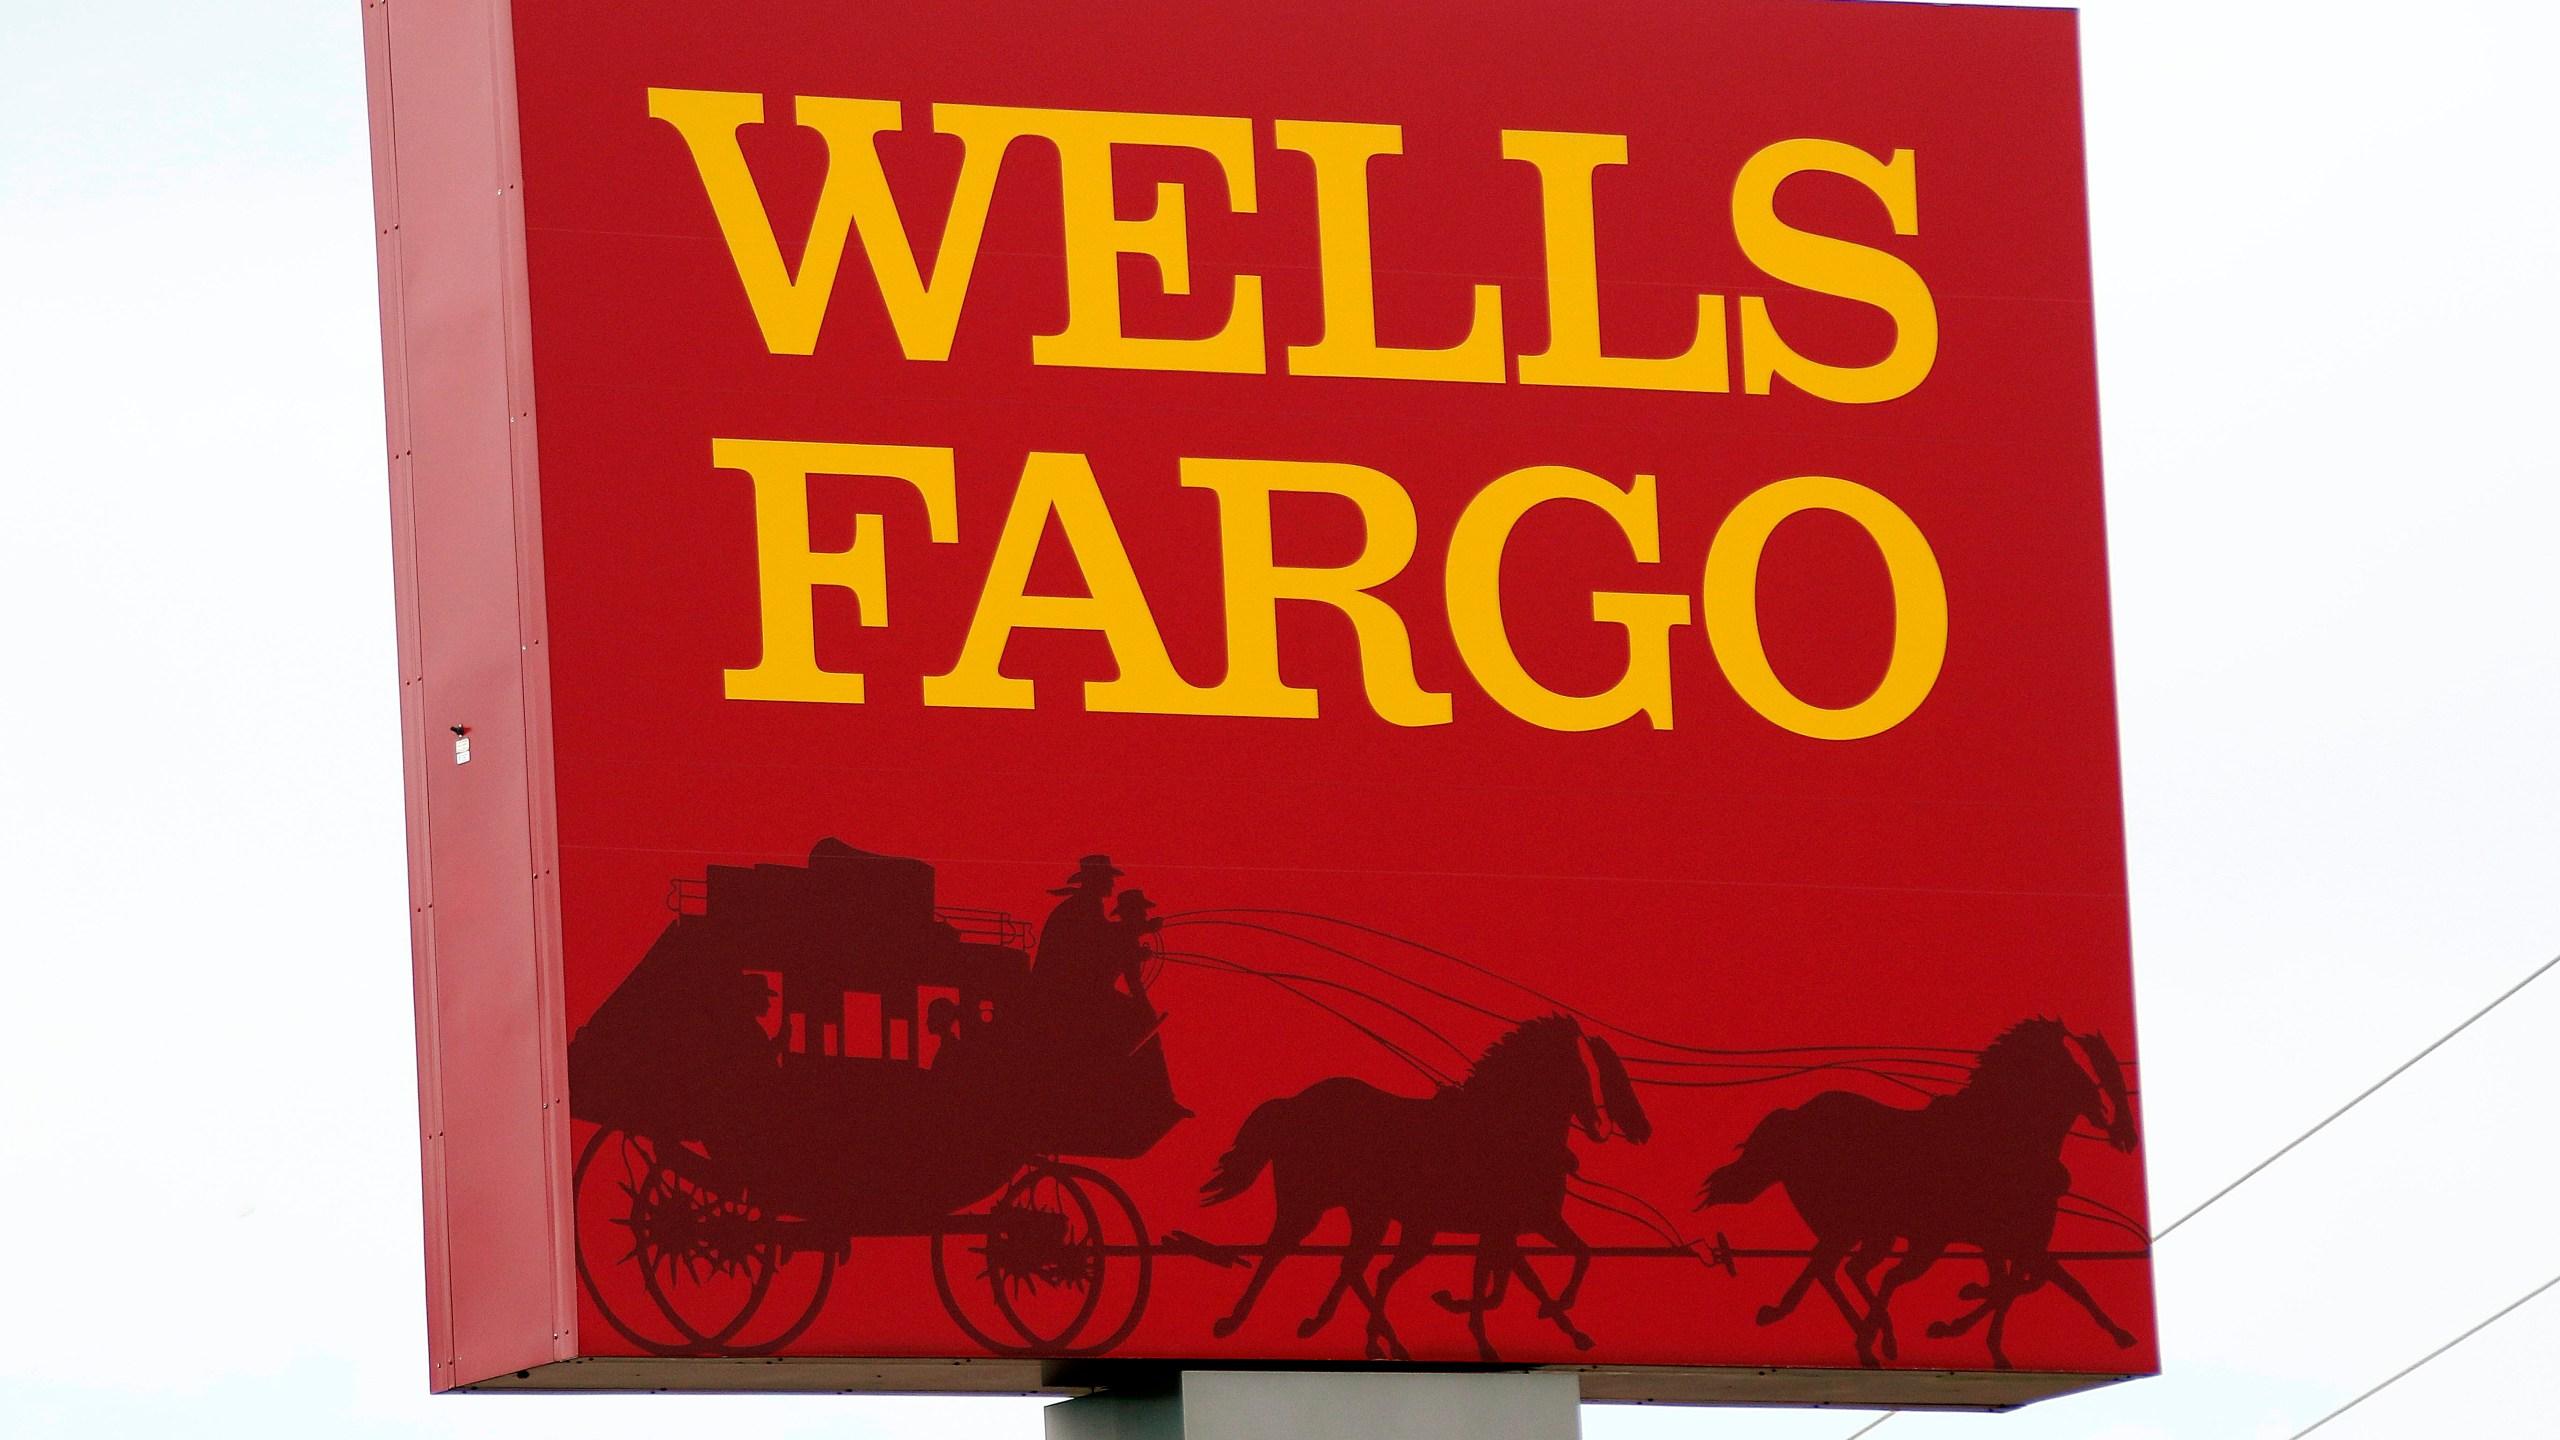 Wells_Fargo_Fine_43183-159532.jpg13441832